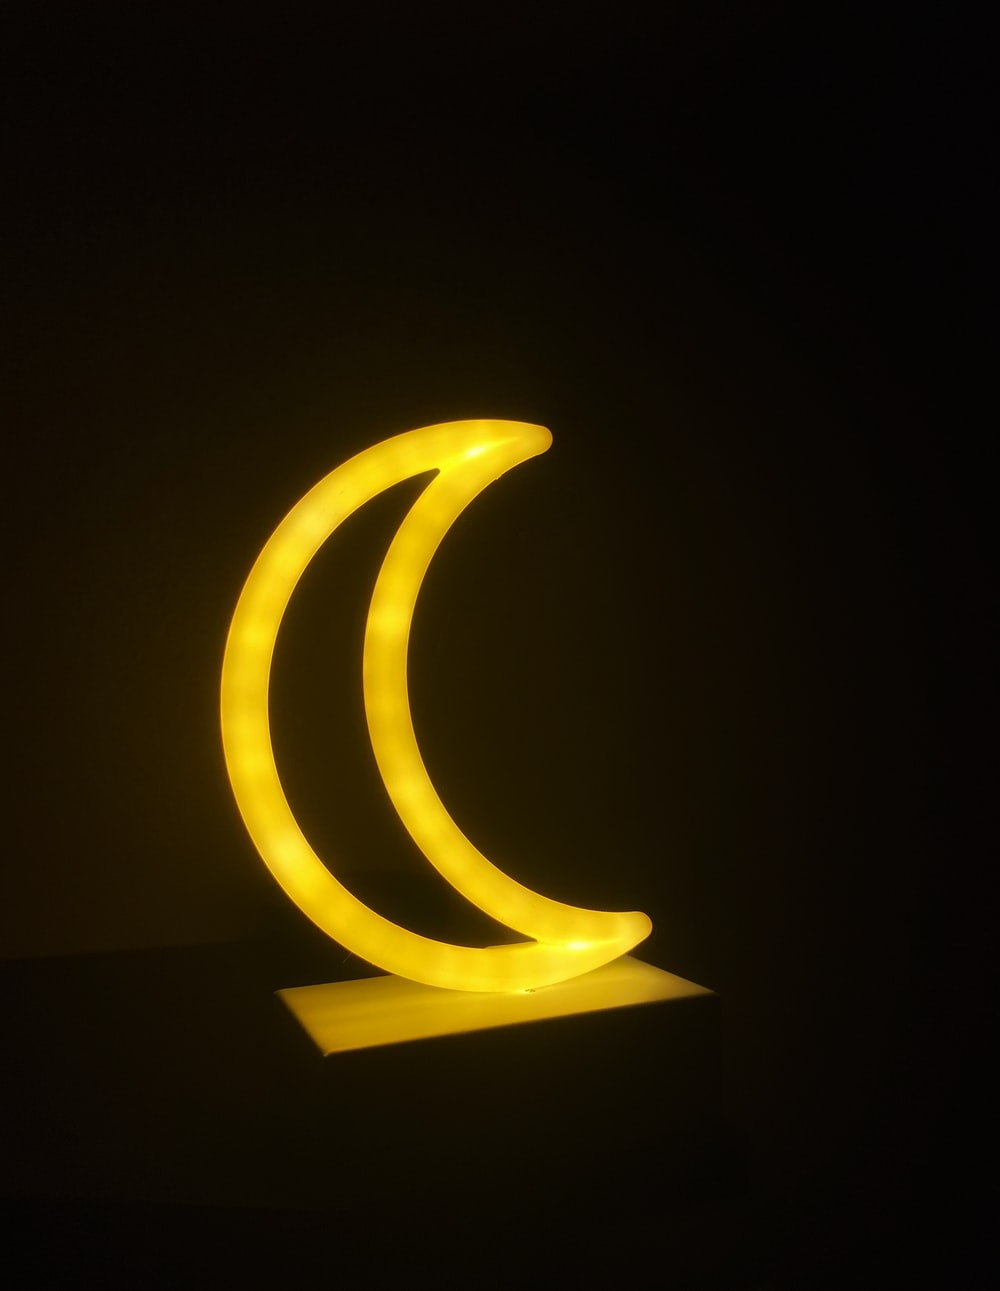 yellow spiral light in dark room